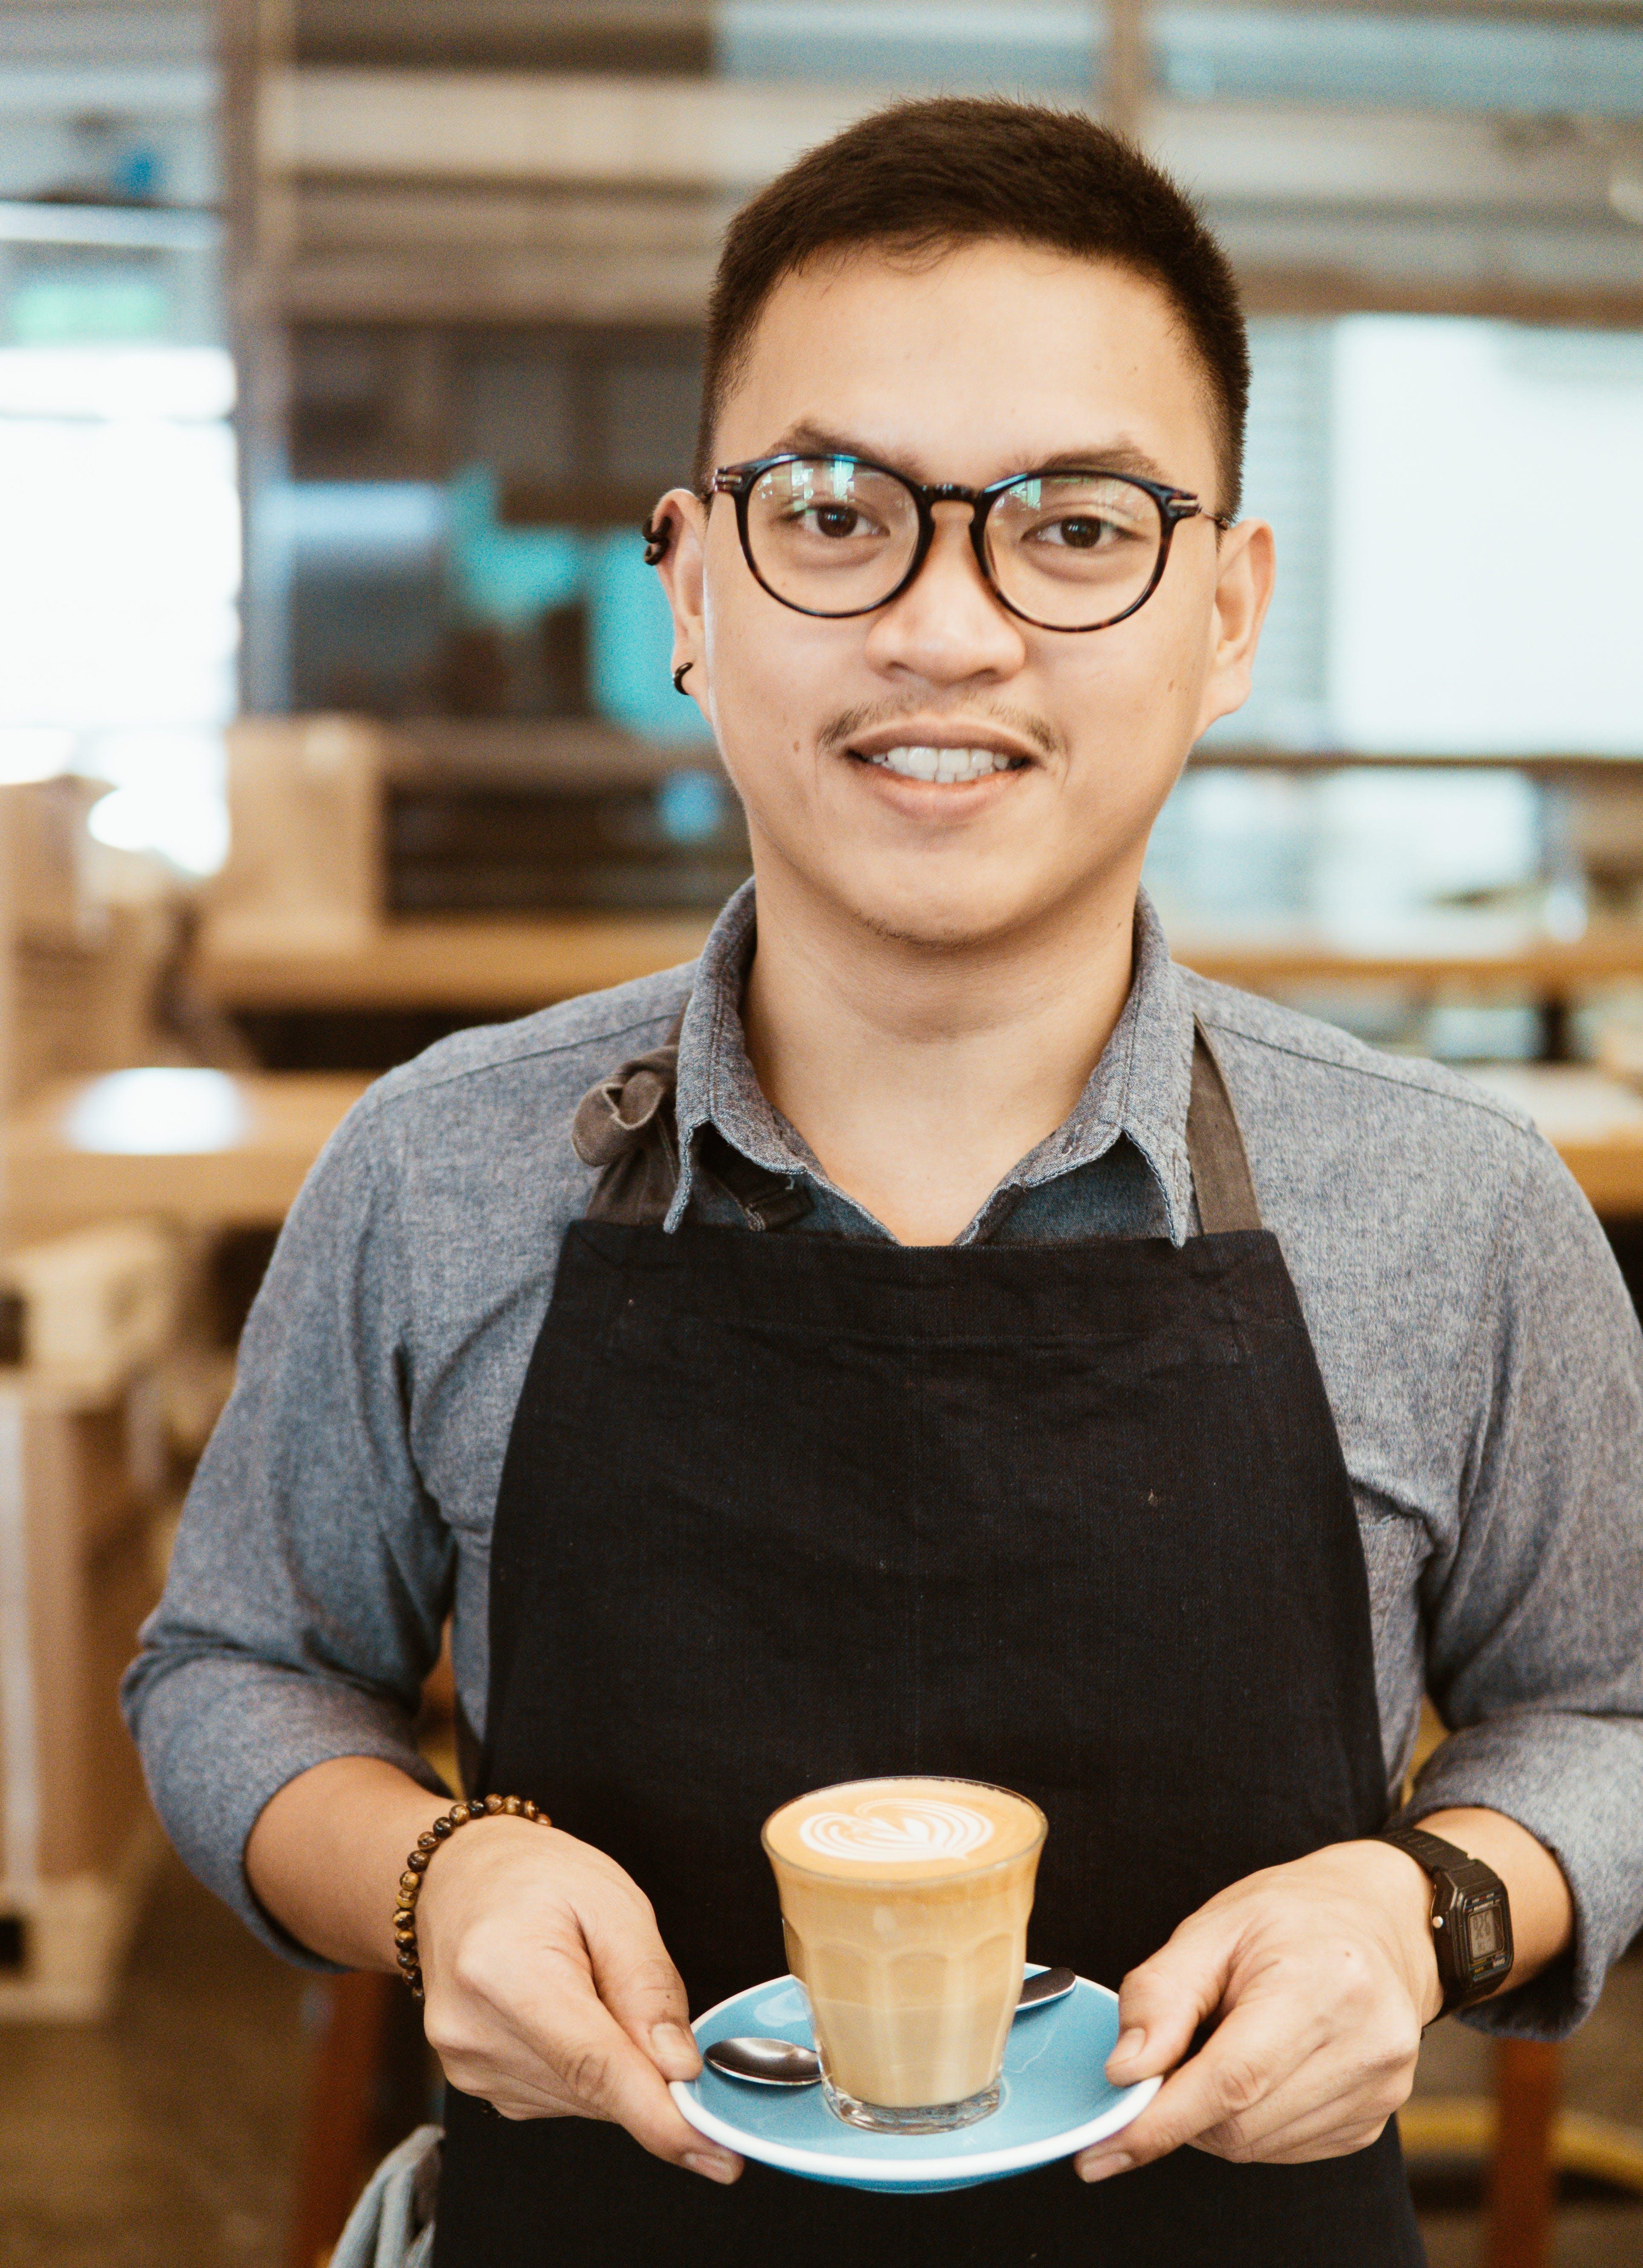 Gratis stockfoto met bril, cappuccino, drankje, drinken